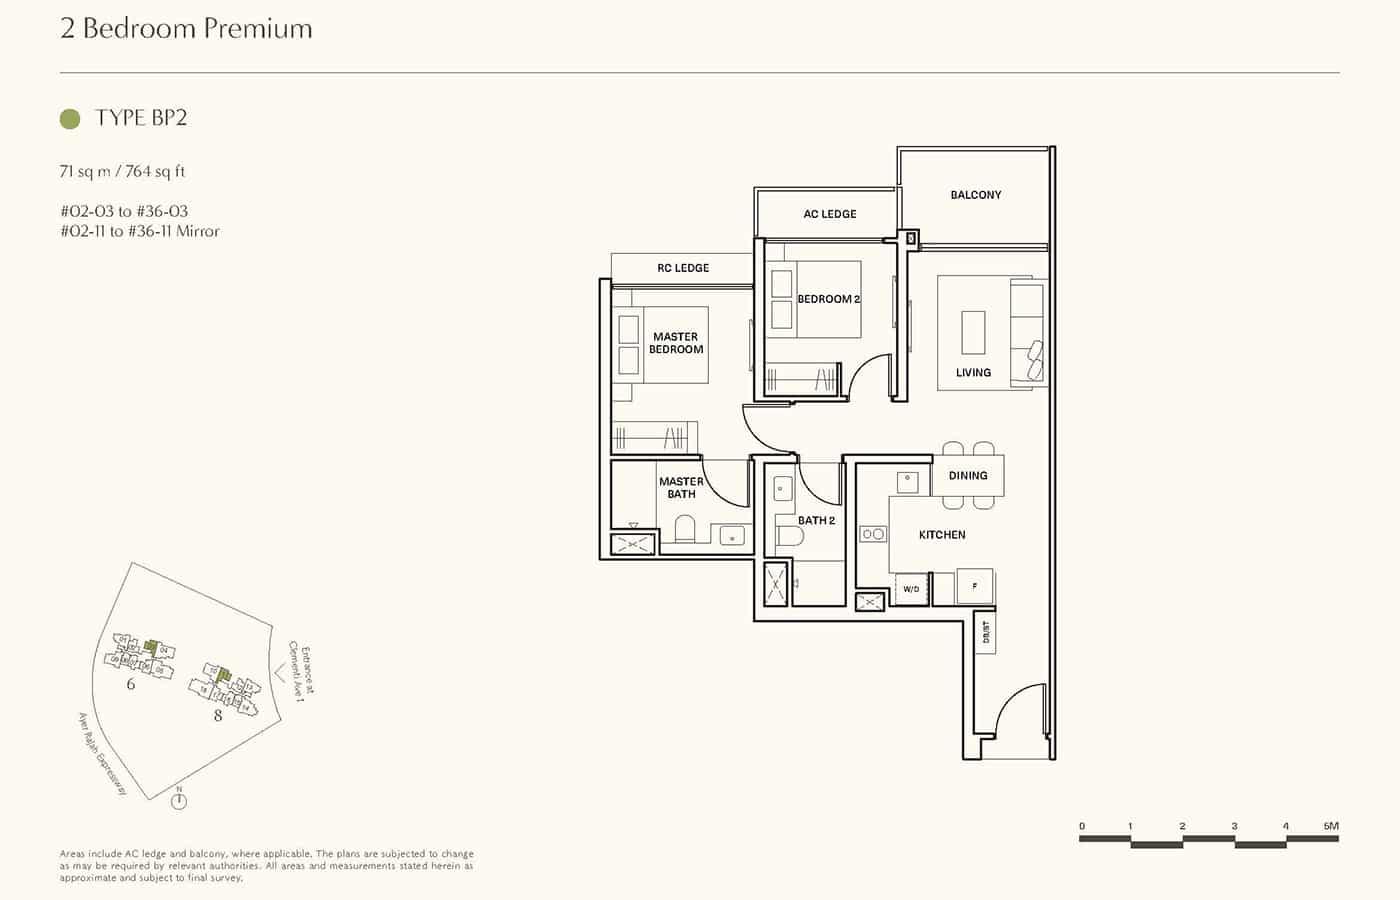 Clavon Condo Floor Plans - 2 Bedroom Premium BP2